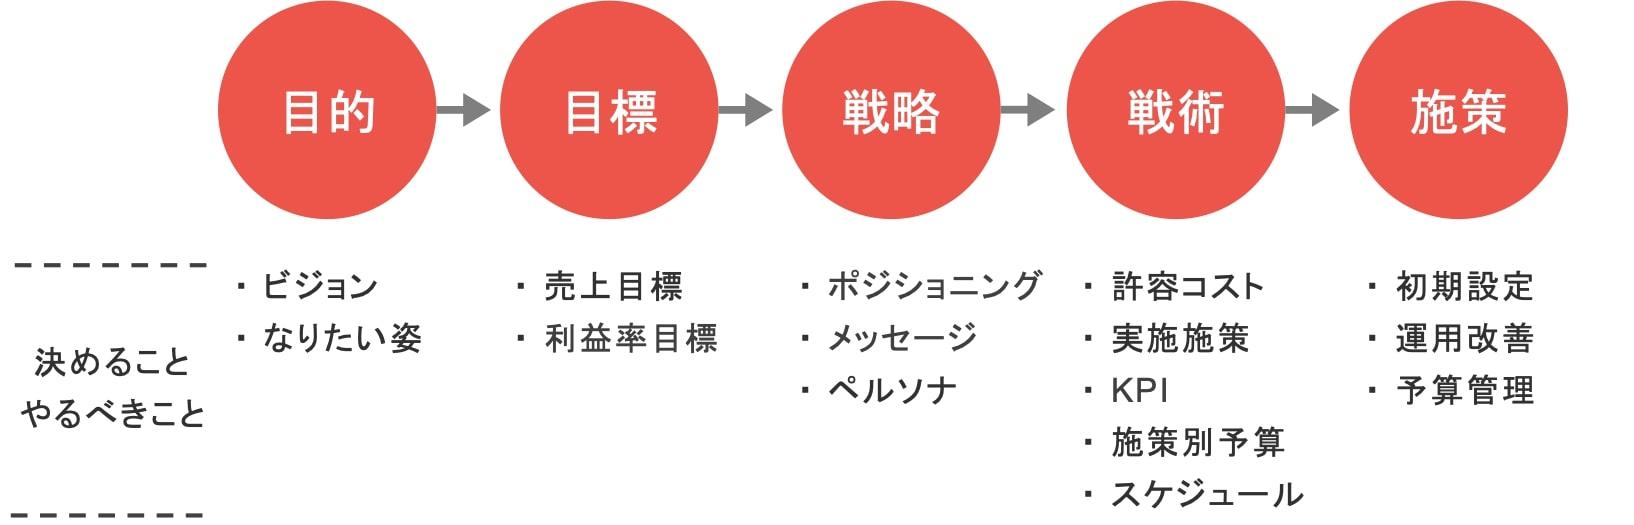 Webマーケティング戦略とWebマーケティング戦術の関係図